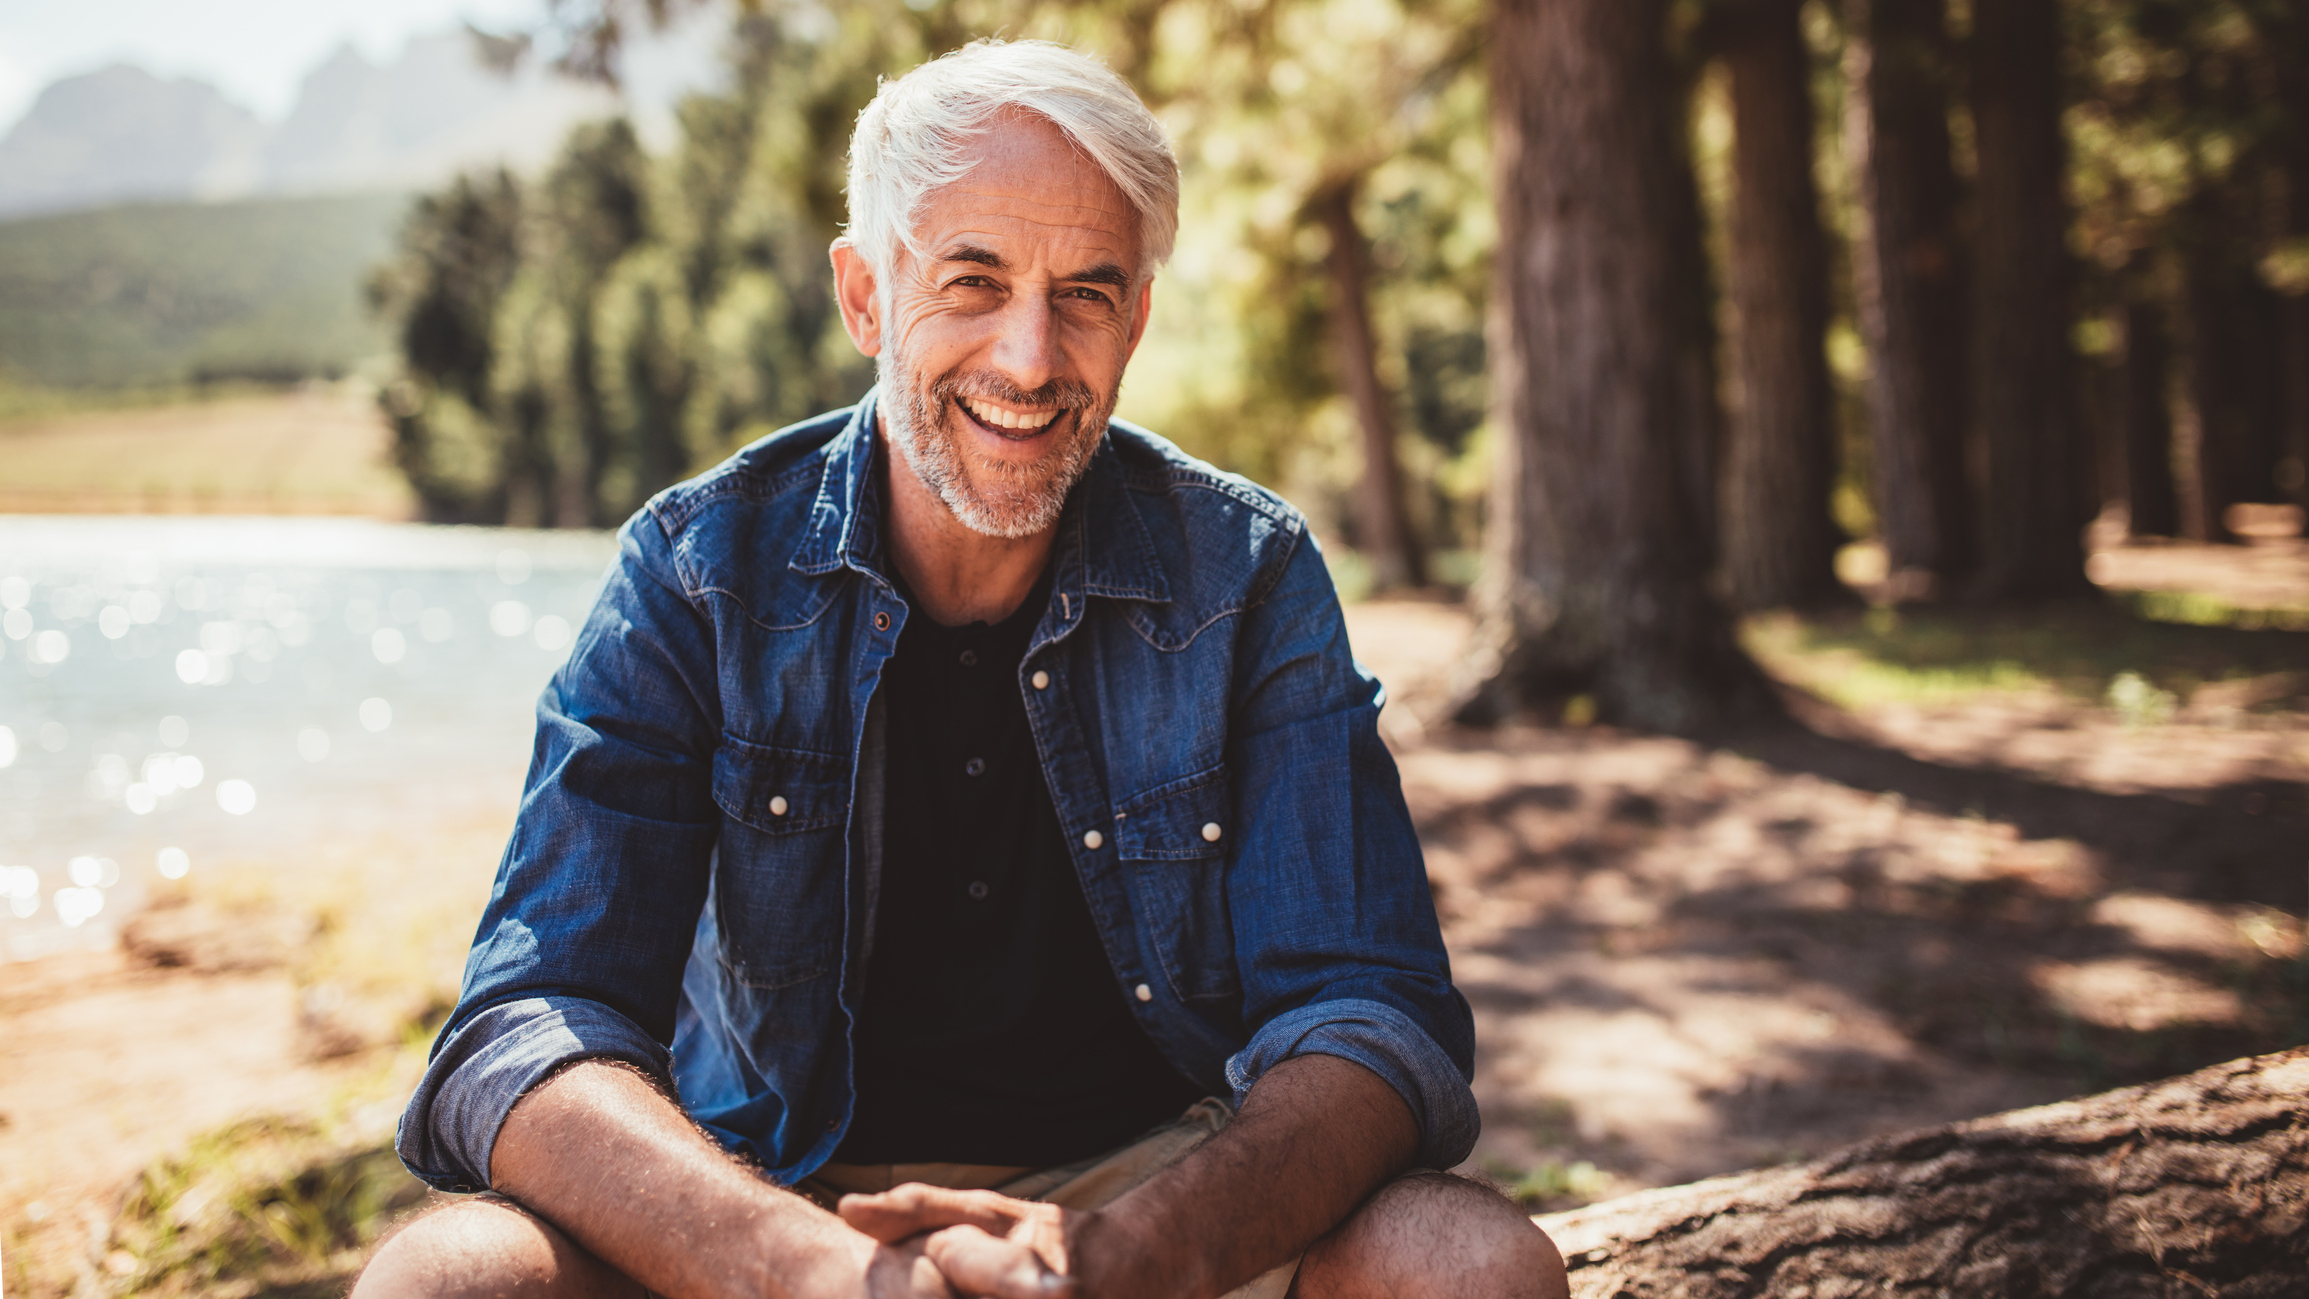 Man up and give prostate cancer the finger - September 2017